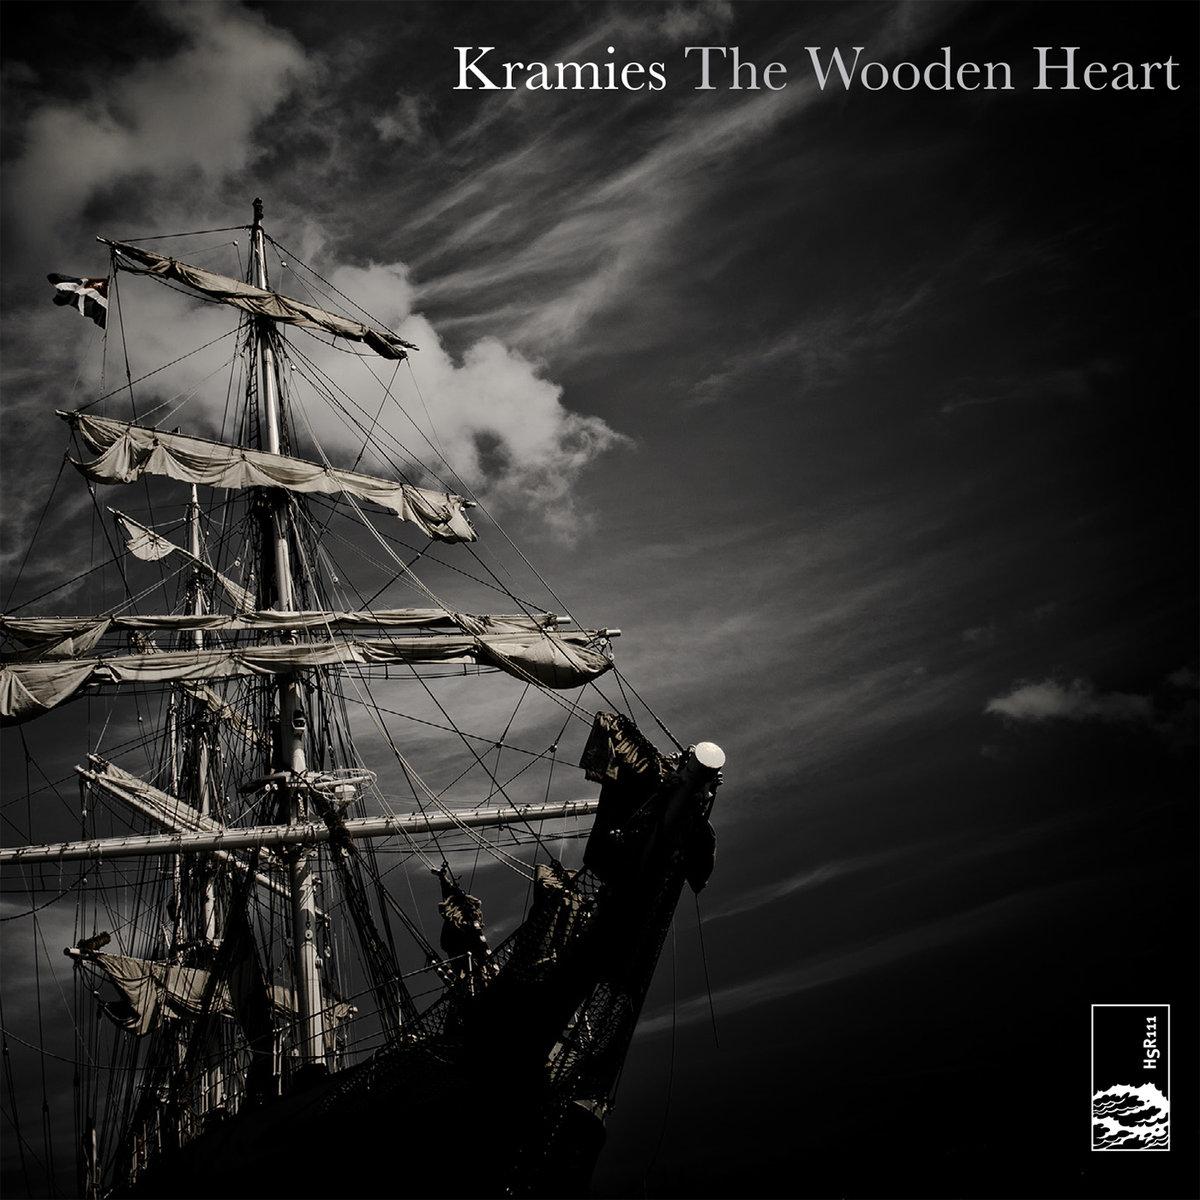 Kramies Wooden Heart Album Cover